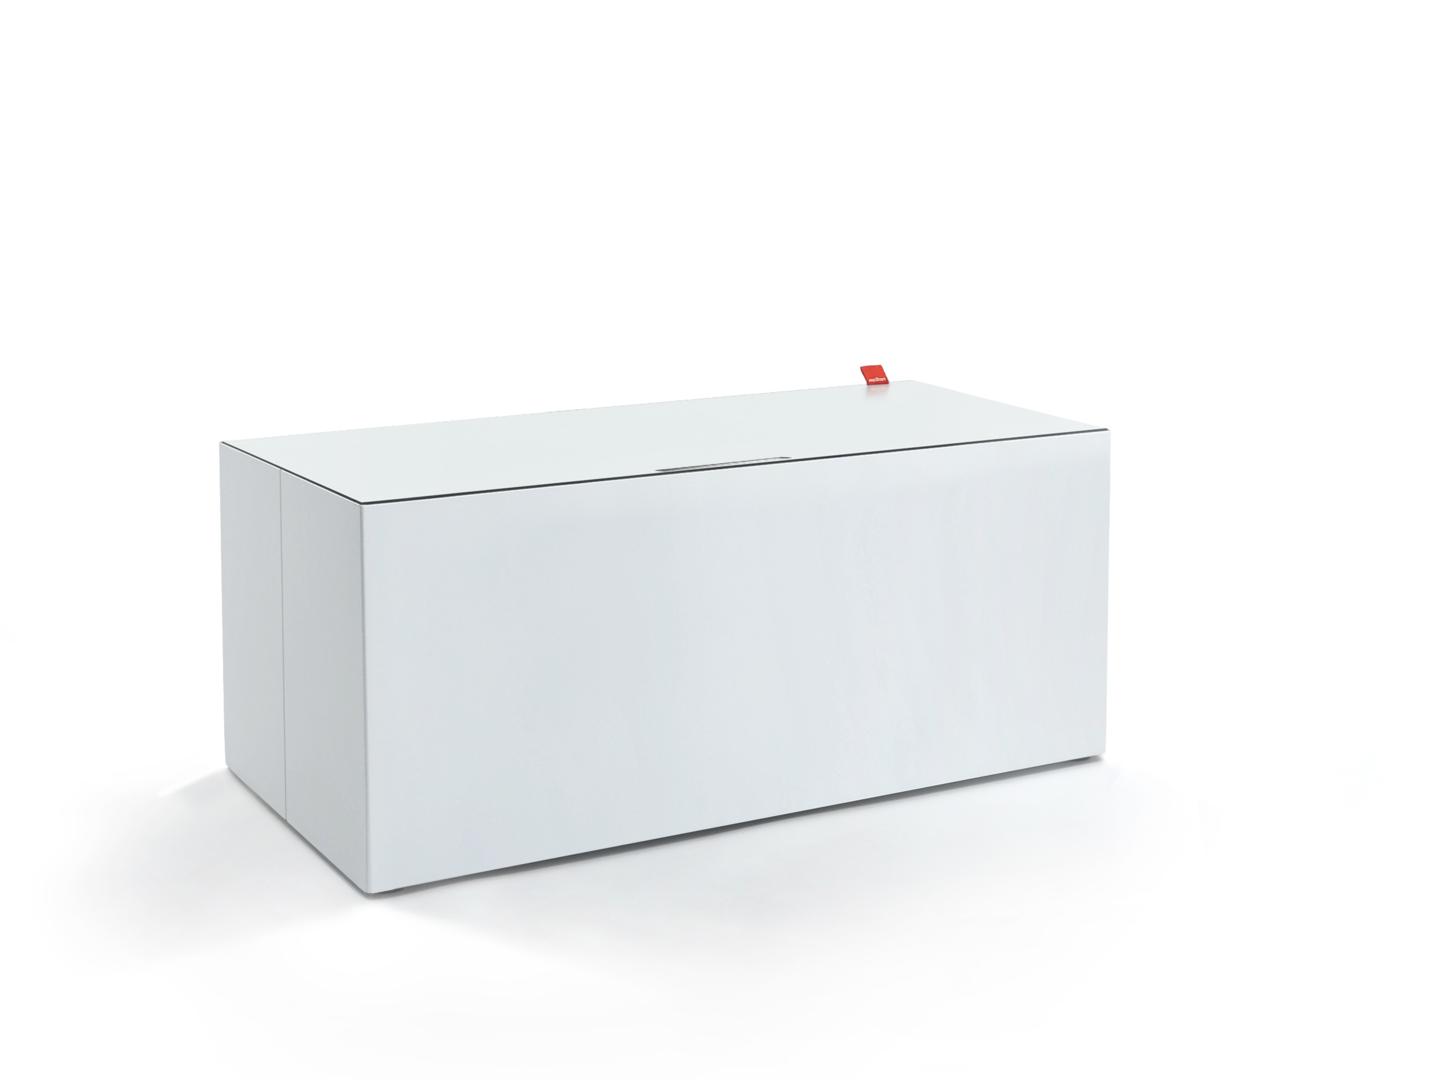 kissentruhe medium weiss weiss methon. Black Bedroom Furniture Sets. Home Design Ideas